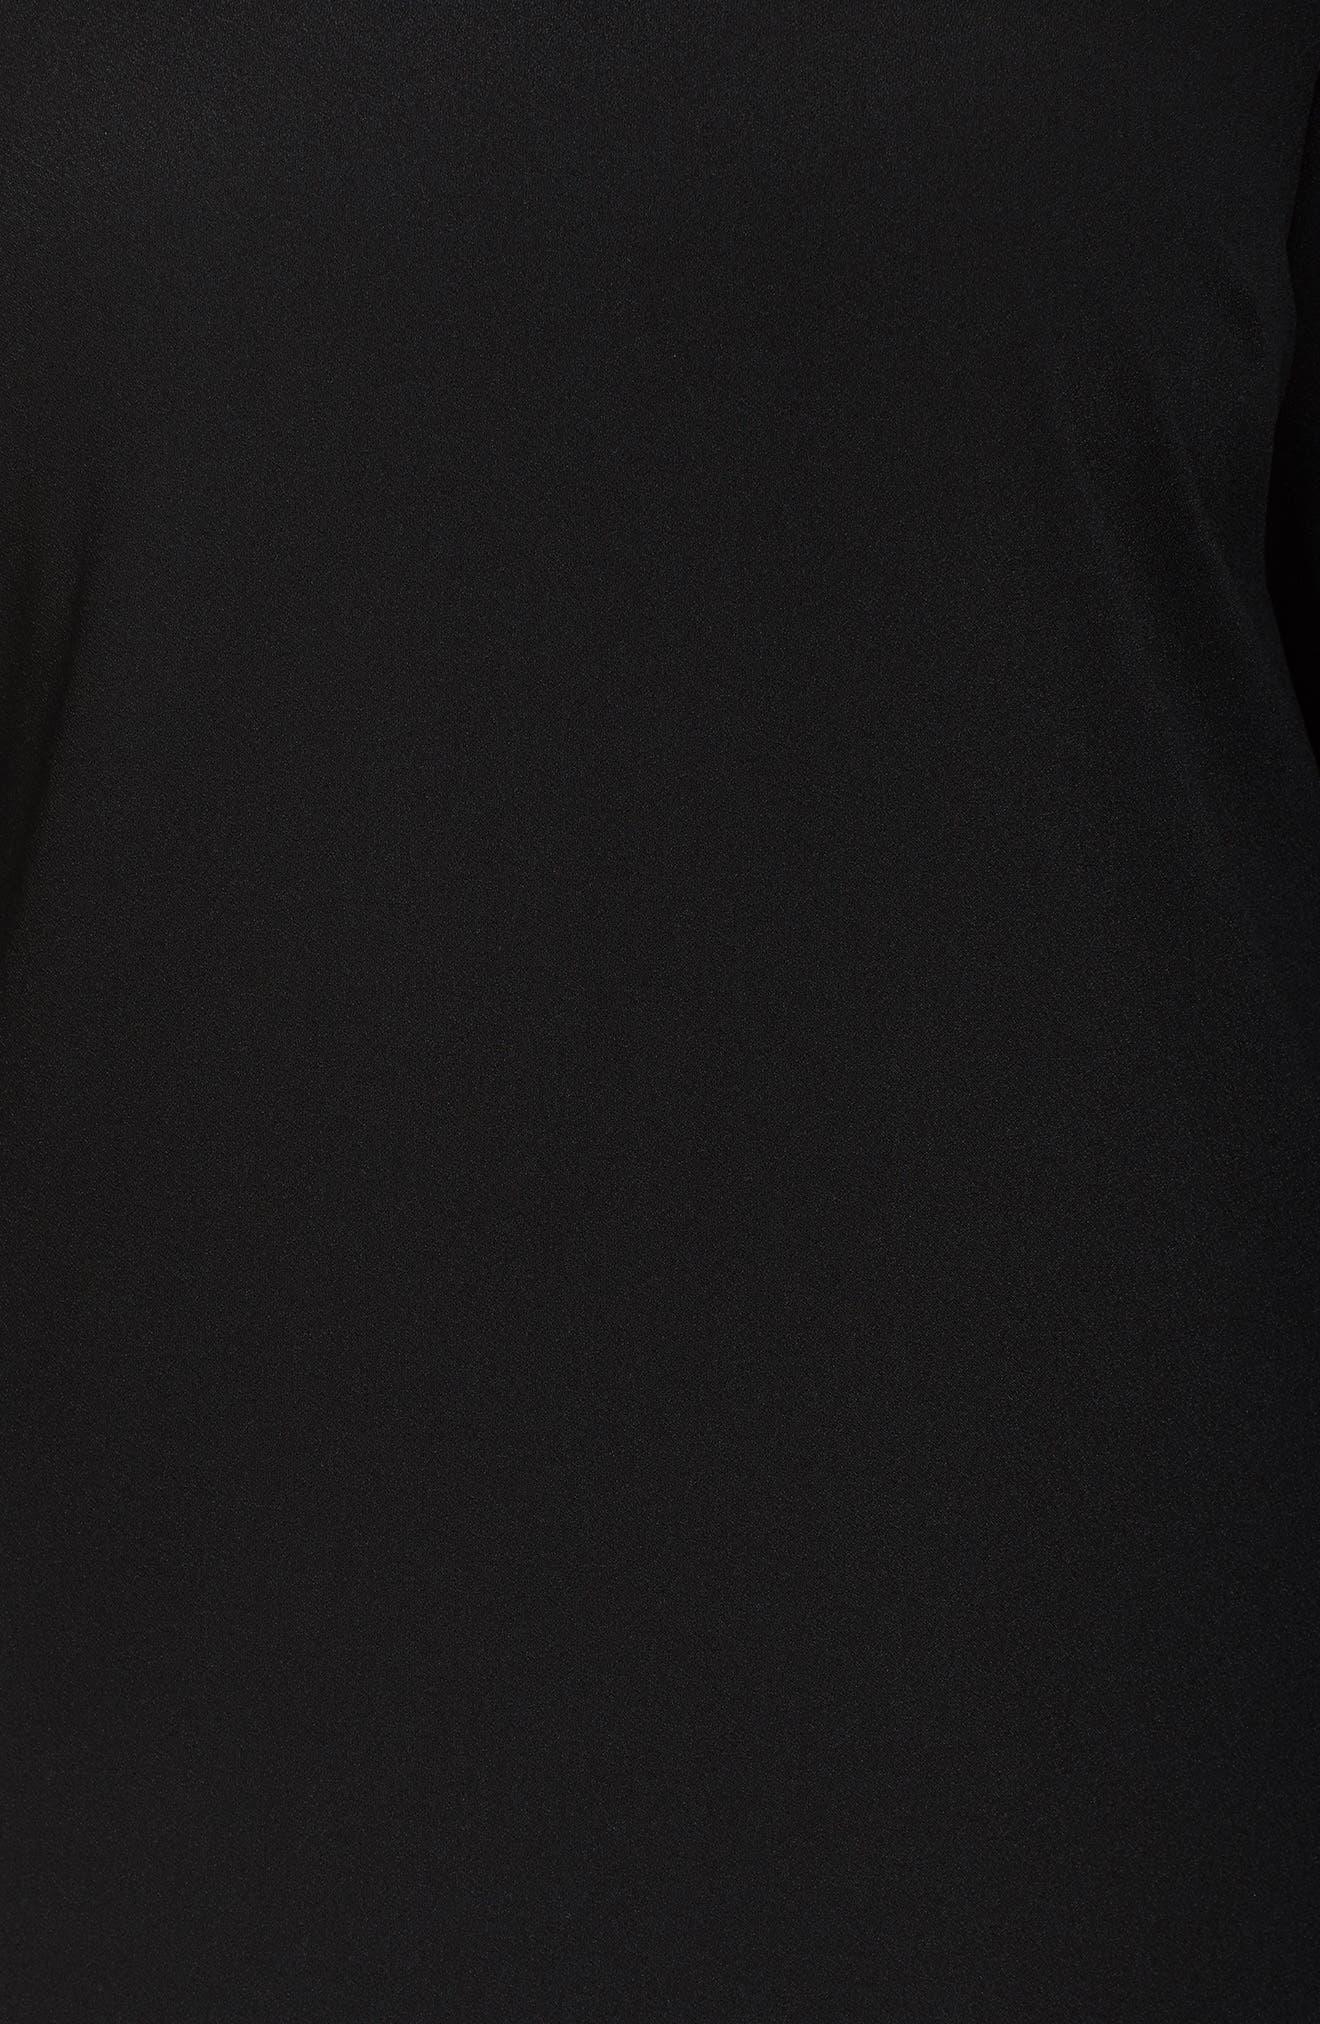 Split Tie Sleeve Shift Dress,                             Alternate thumbnail 5, color,                             001